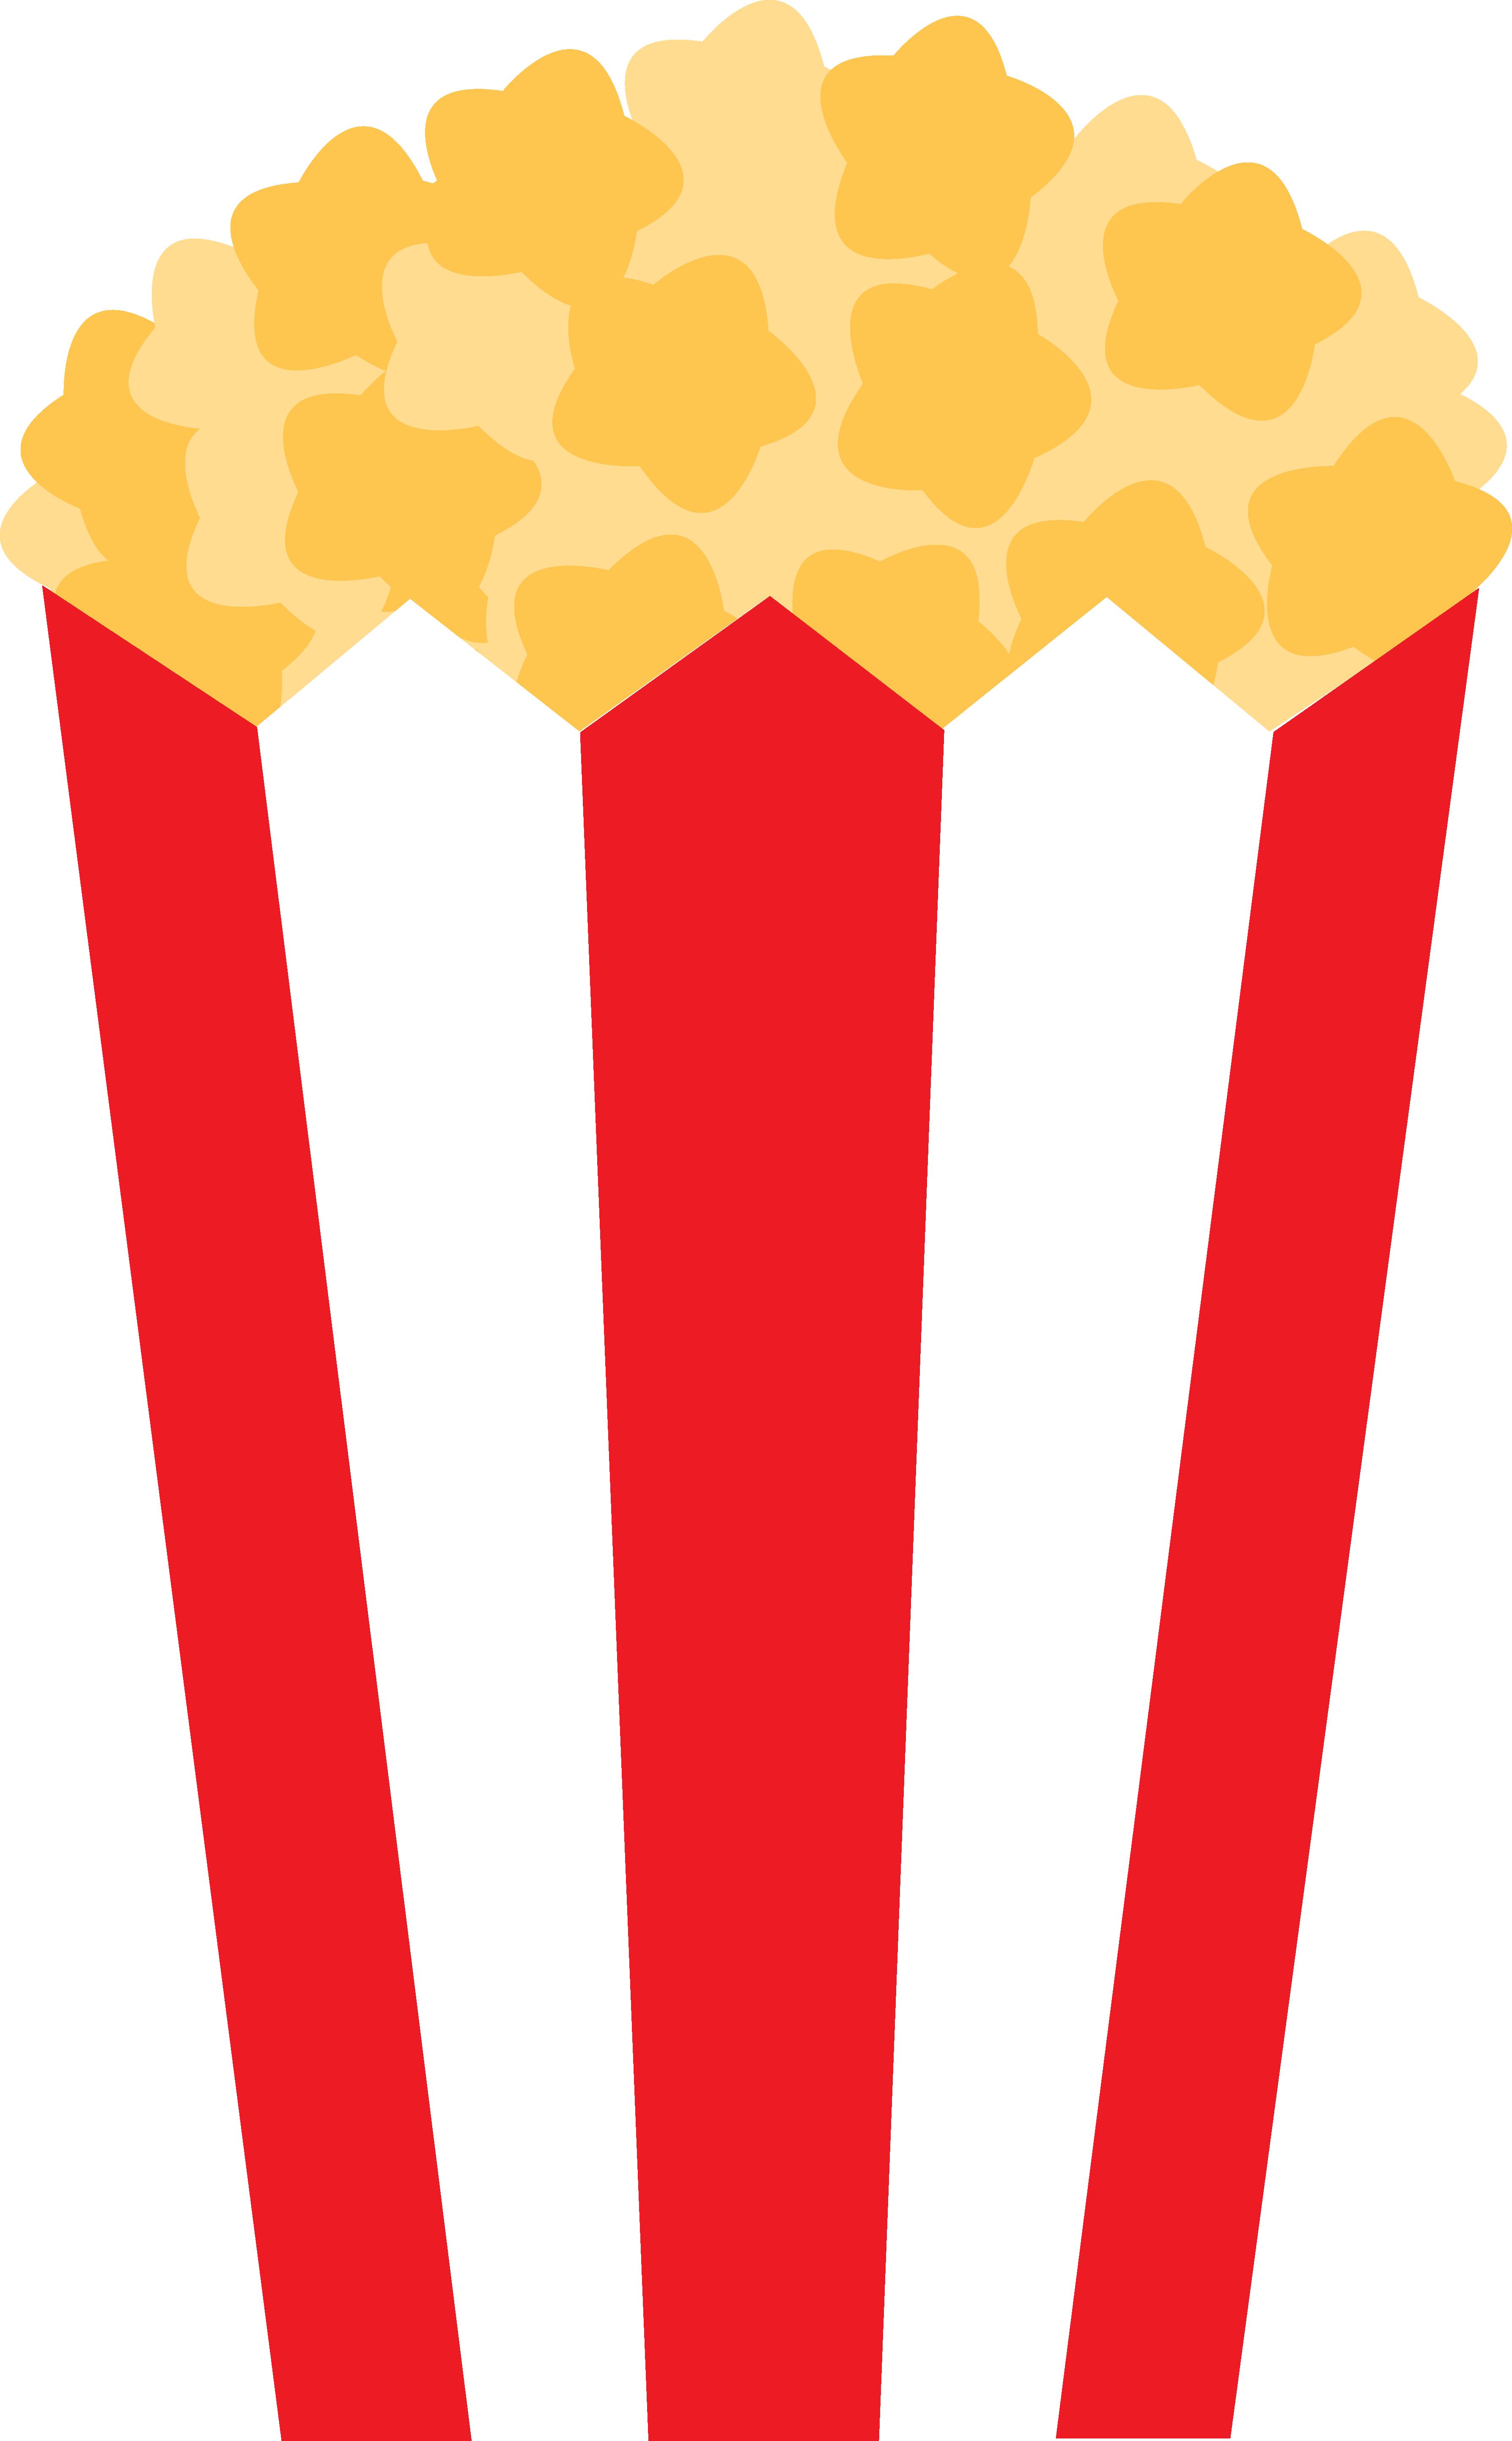 Popcorn kernel clipart free images 6